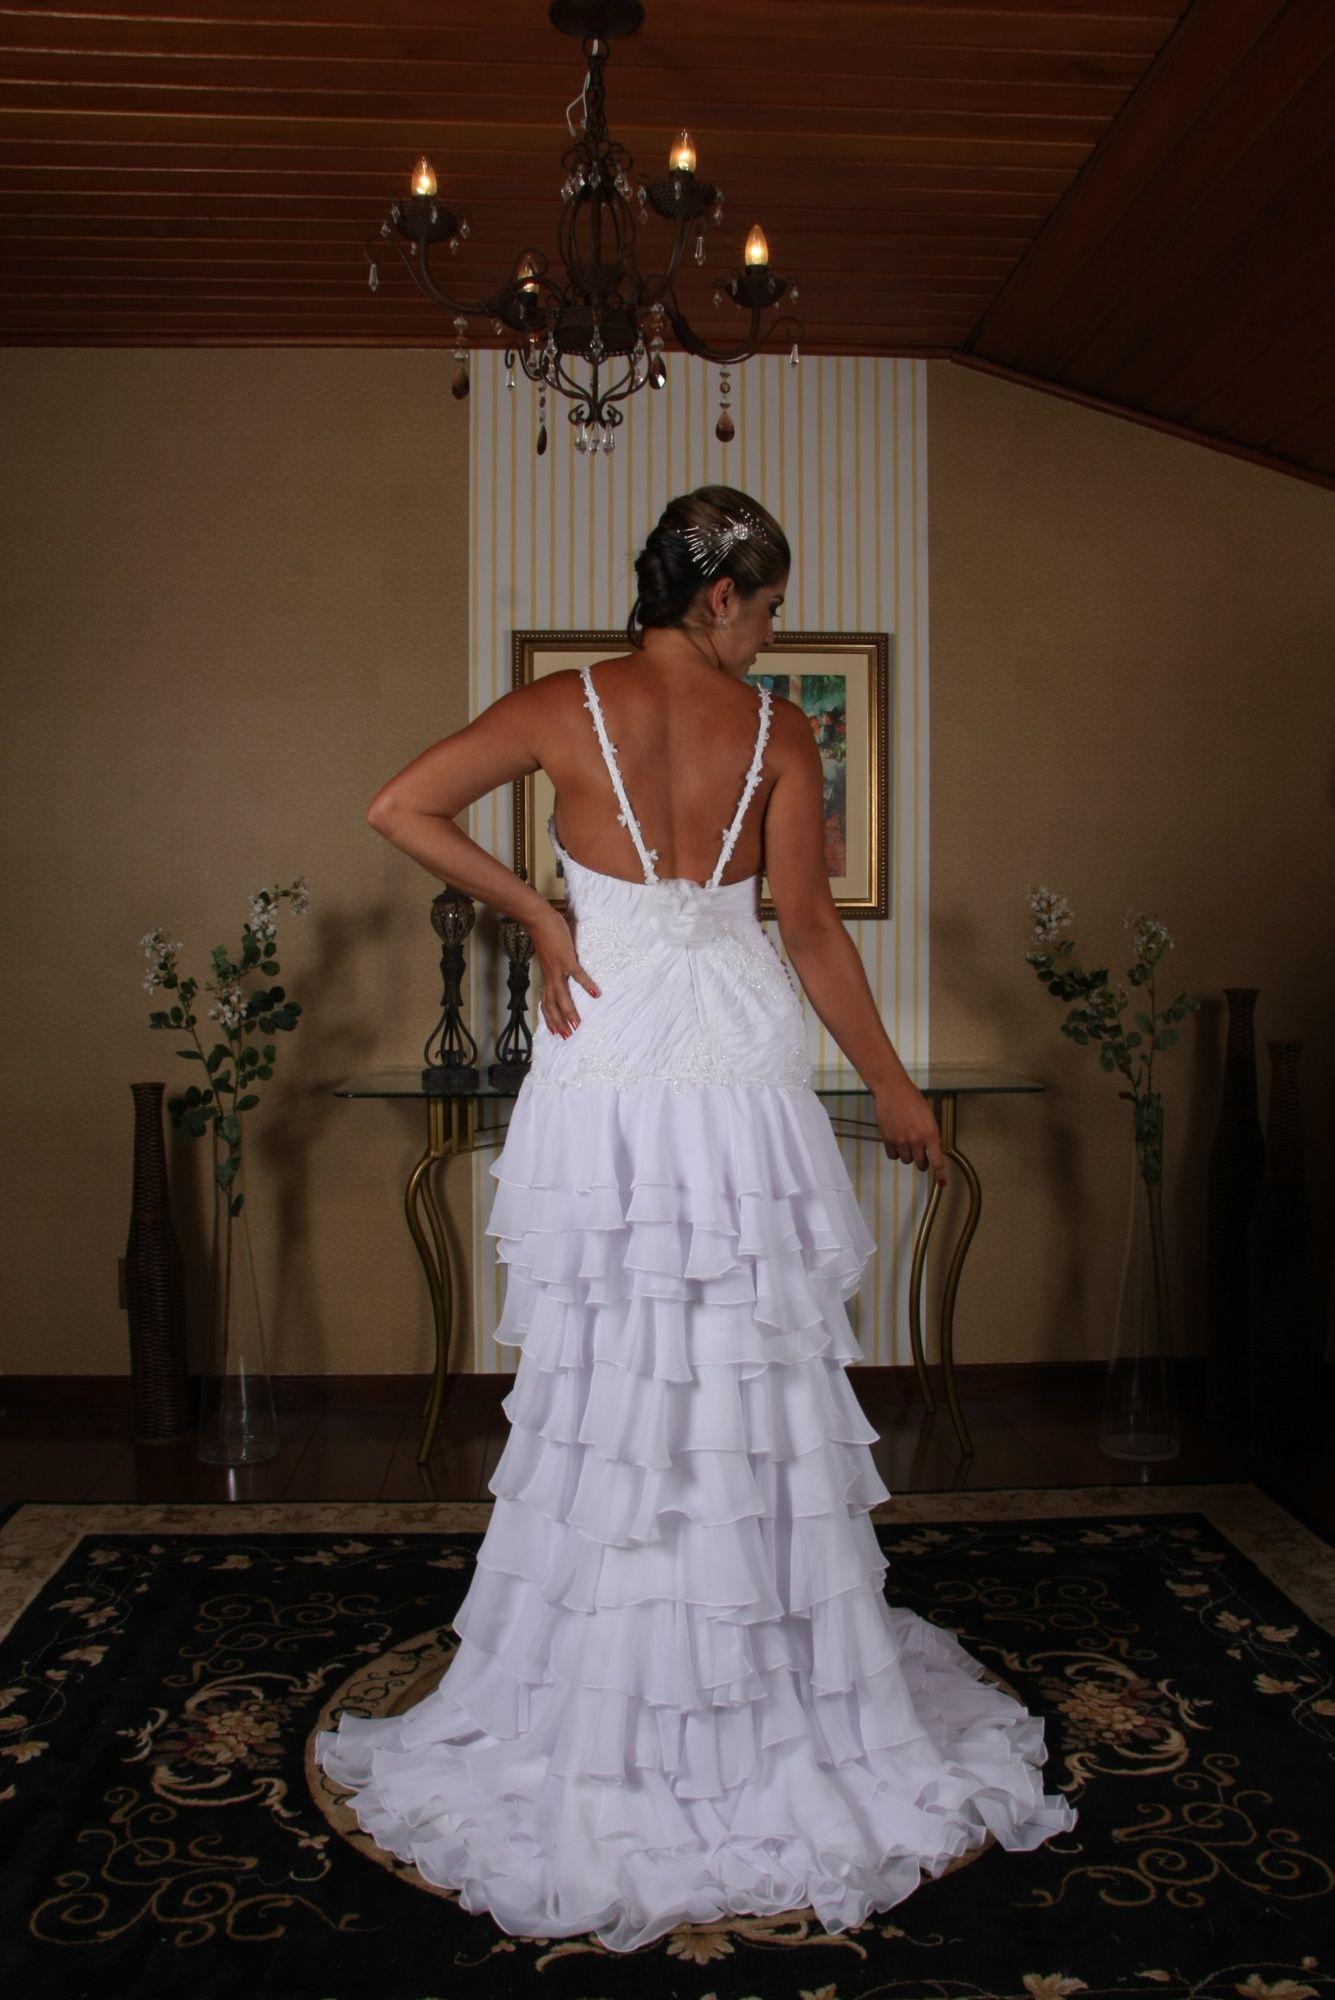 Vestido de Noiva Curto - 3 - Hipnose Alta Costura e Spa para Noivas e Noivos - Campinas - SP Vestido de Noiva, Vestido de Noiva Curto, Hipnose Alta Costura